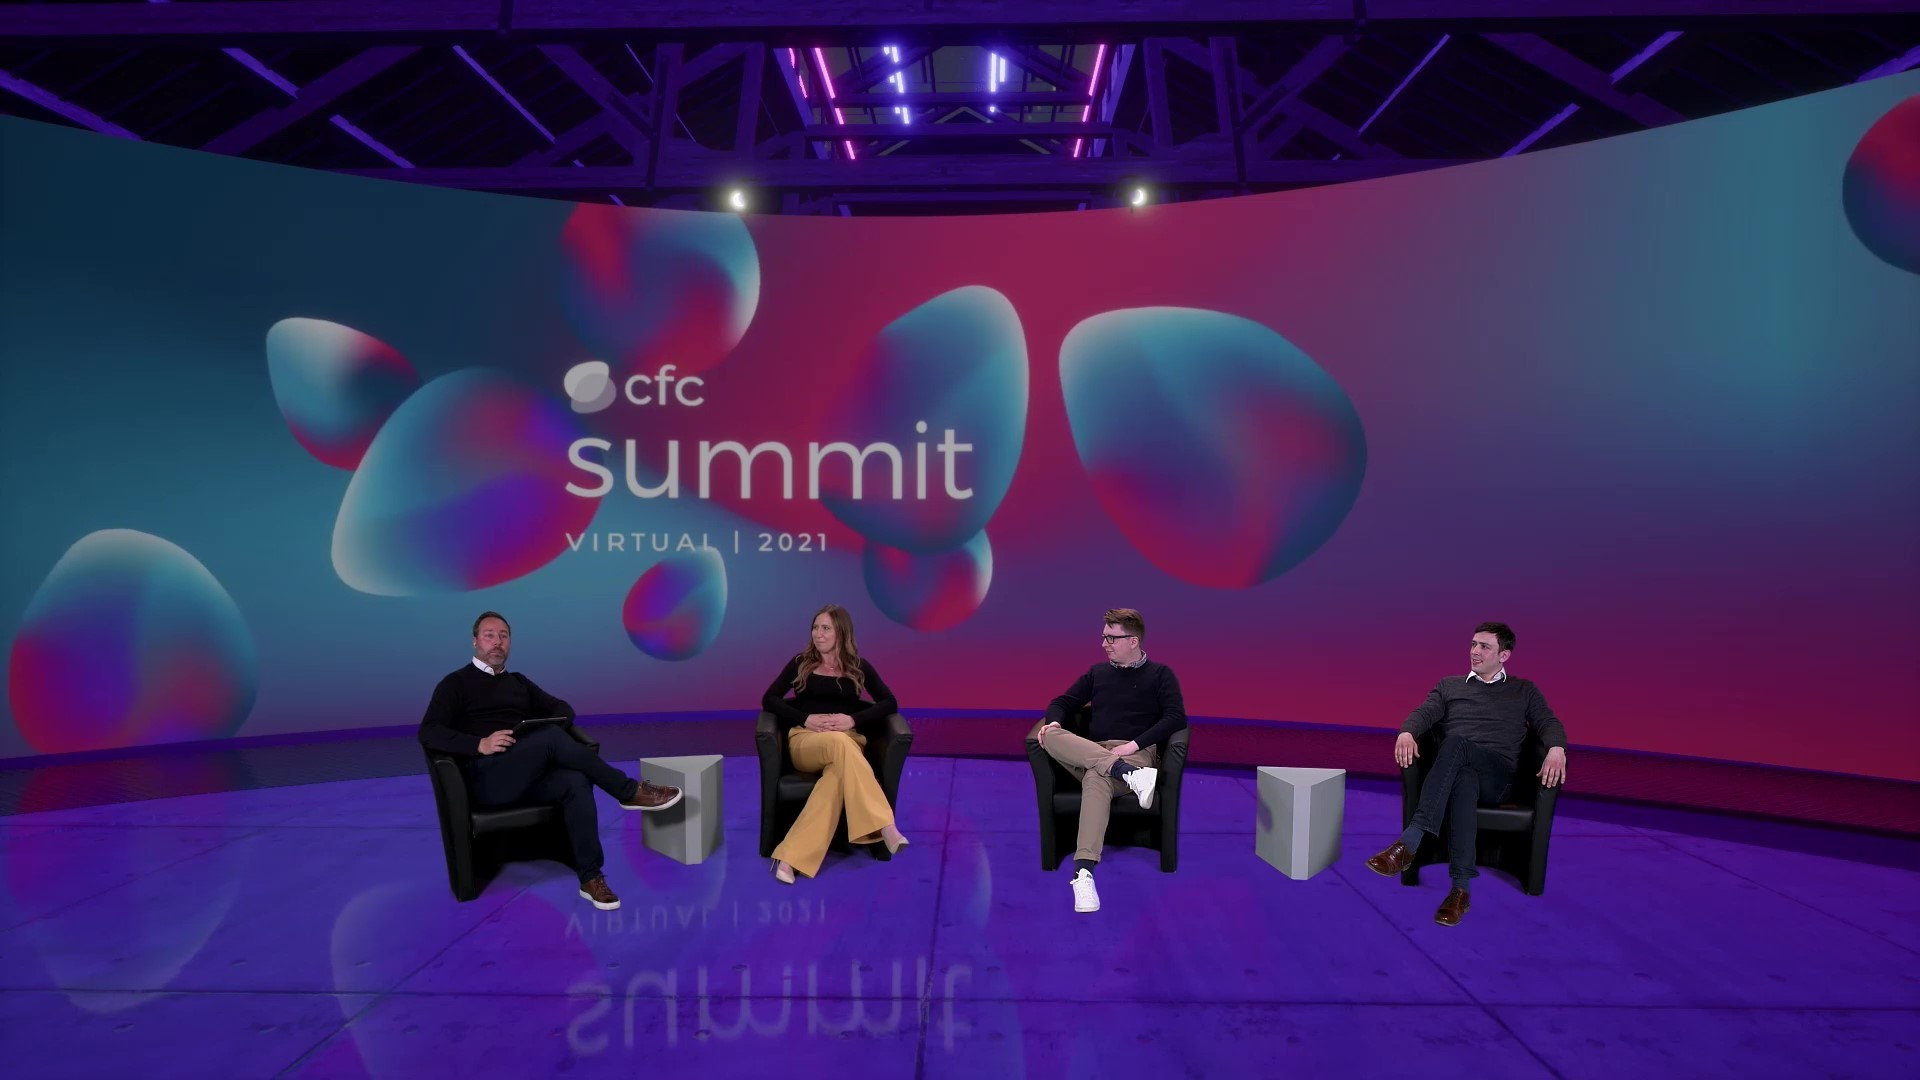 CFC Summit